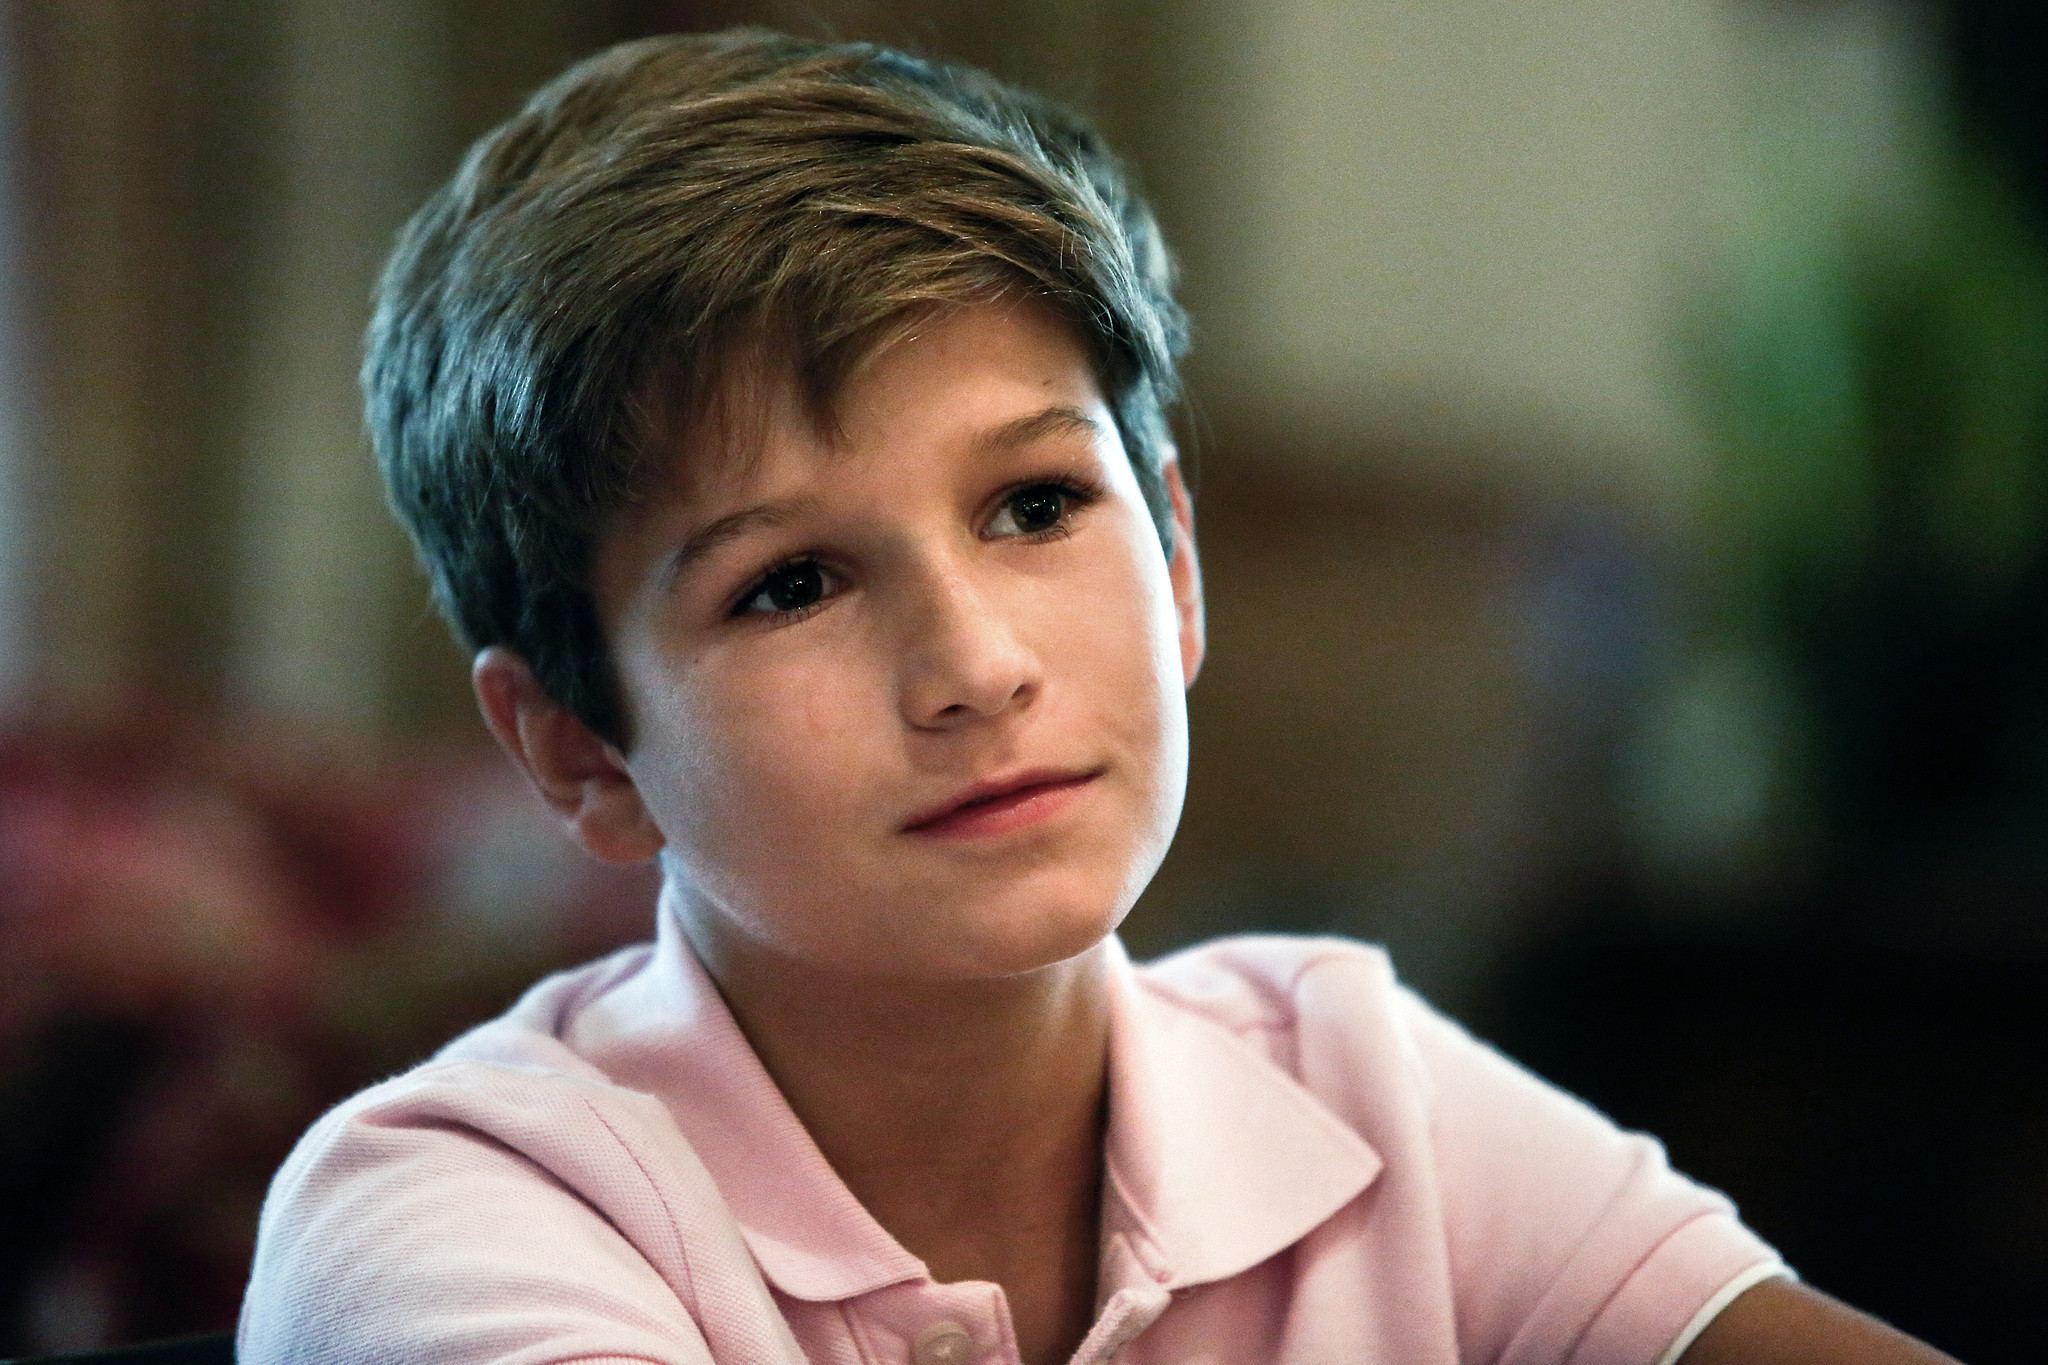 Young Male Child Actors Child actor mak...